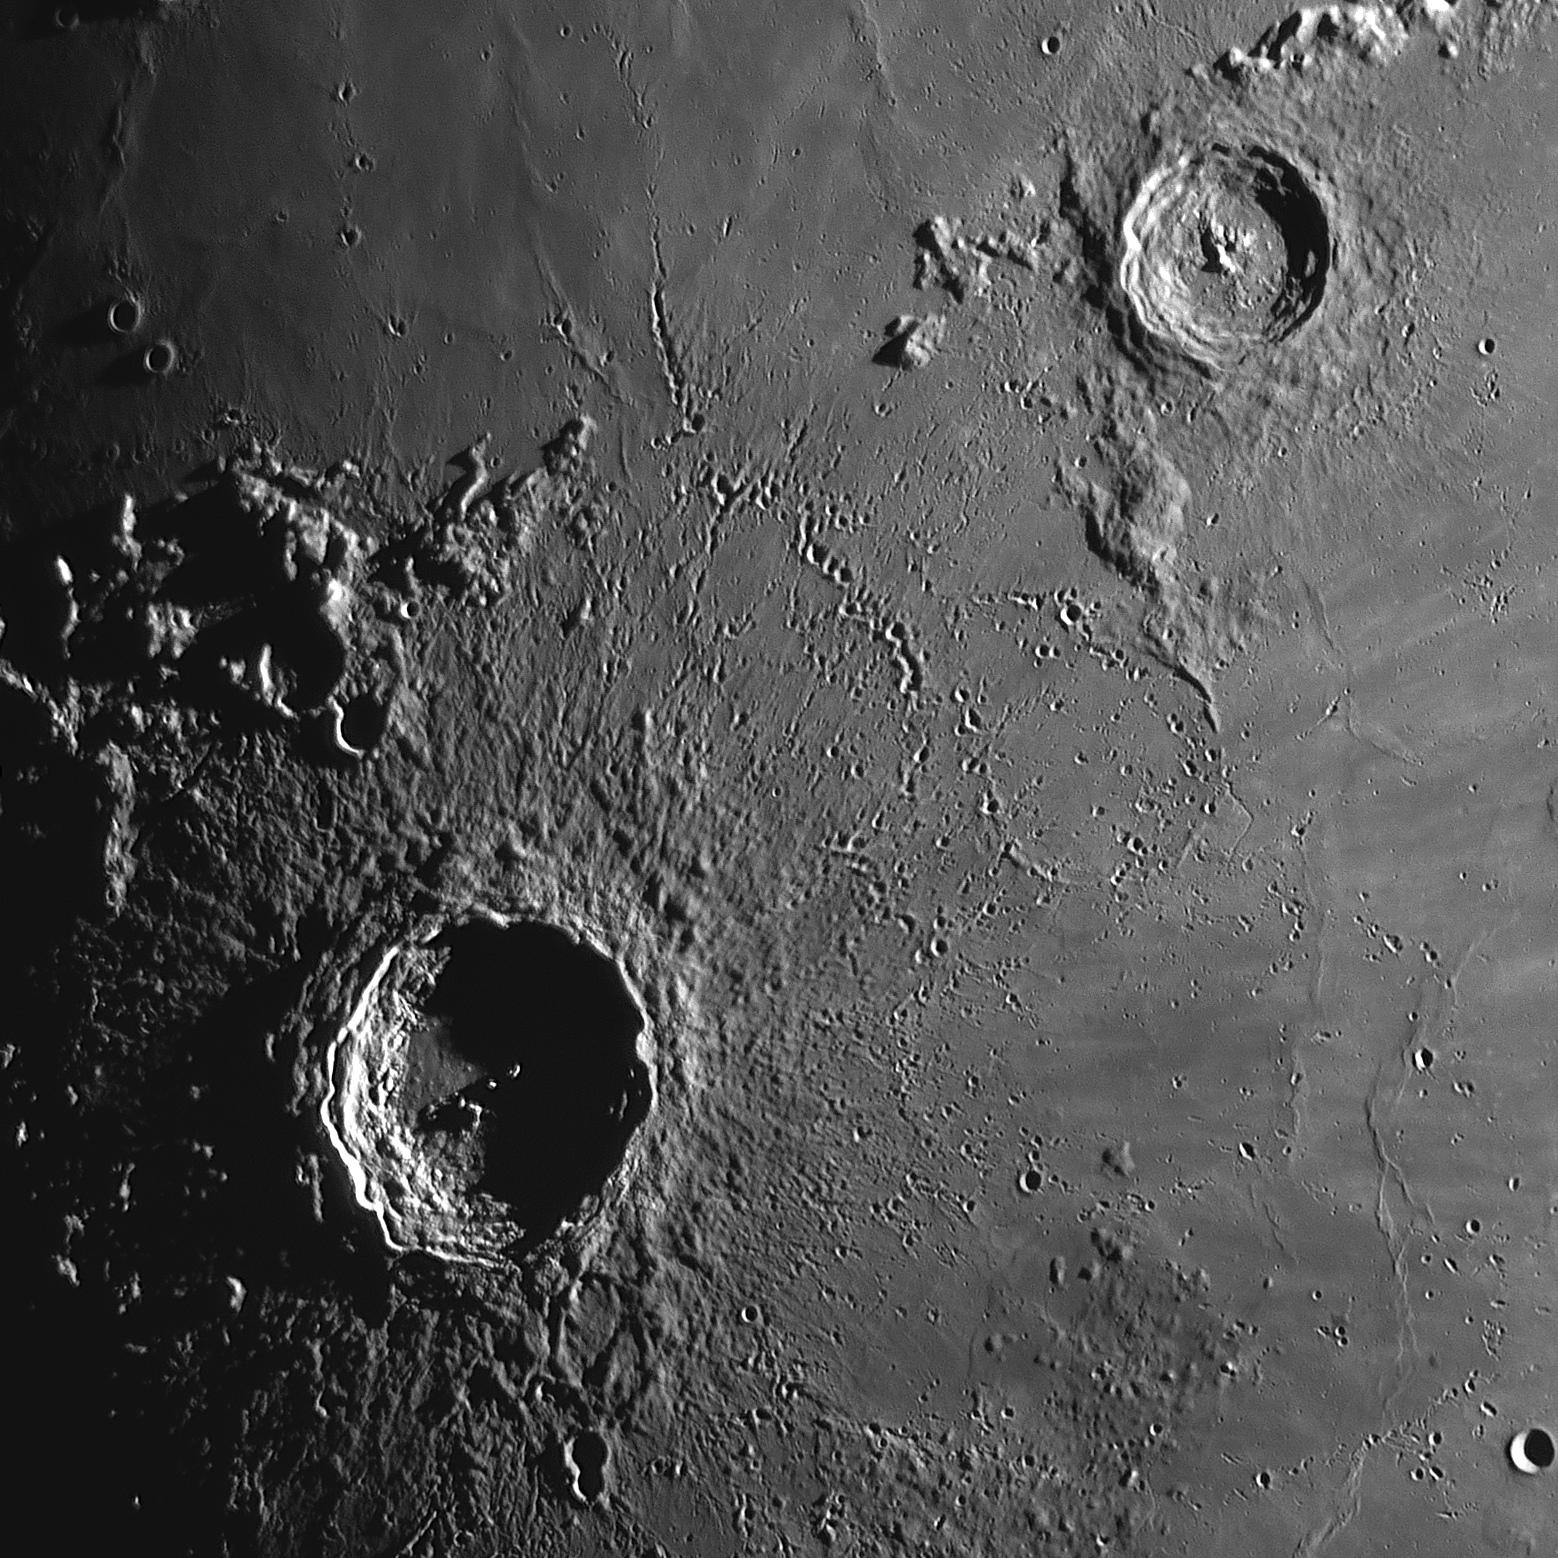 5cddc919367f2_2019-05-13-2027-R-Moon.jpg.2c0341ff0d51820dcc2e97658ff508ed.jpg